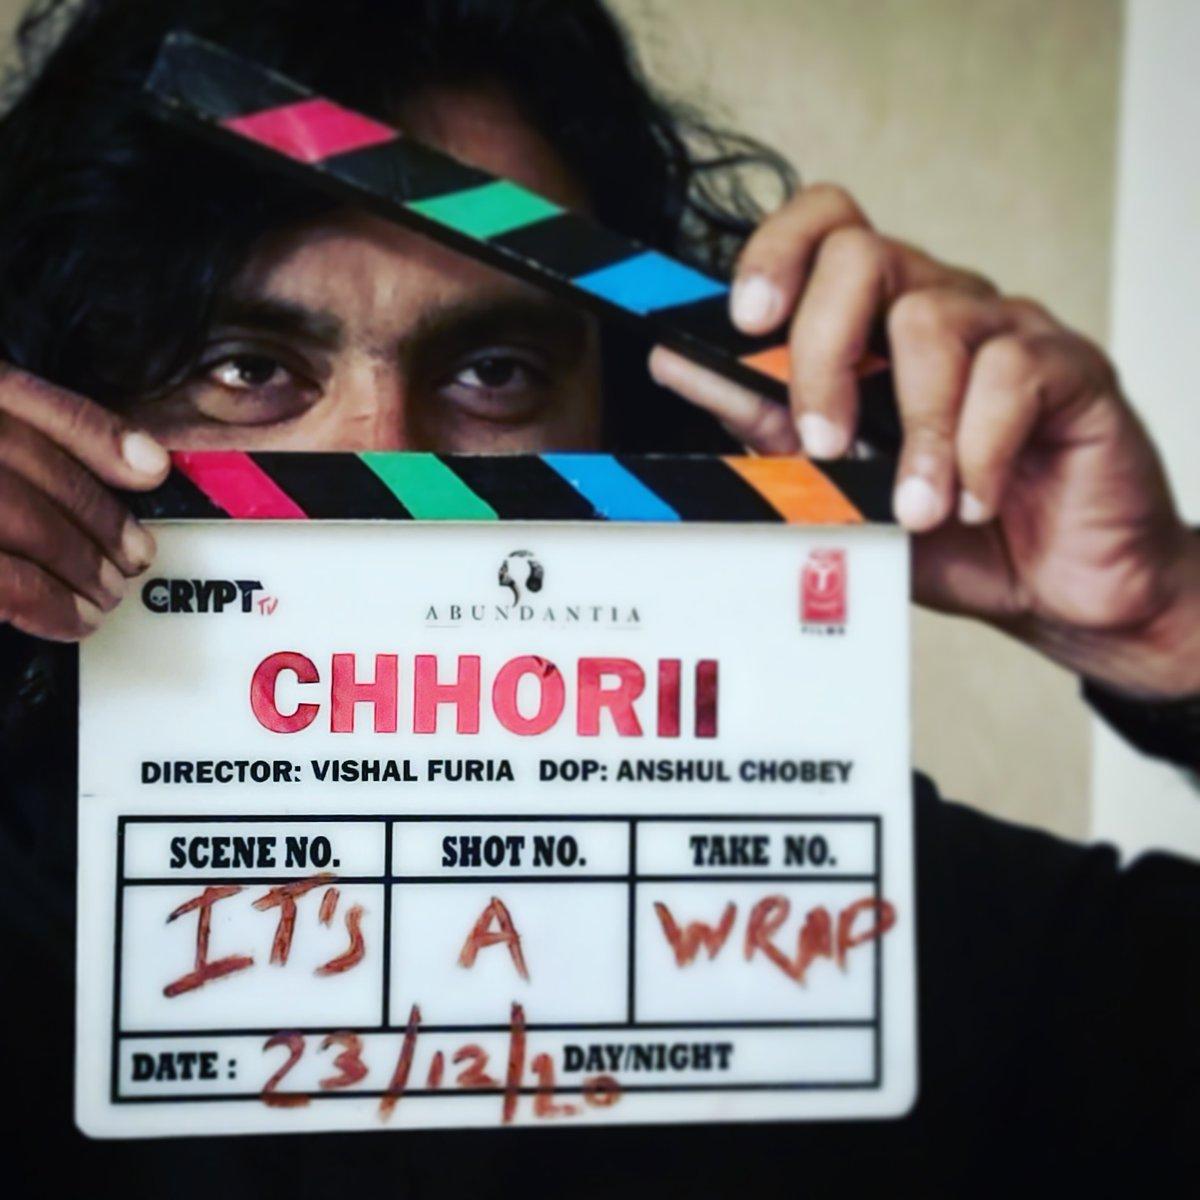 "Reels of ""Chhorii"" hv been successfully filmed with Blood, Sweat and Tears literally.💀 #chhorii #horror #Hindi @Abundantia_Ent @vikramix @ShikhaaSharma03 @NotJackDavis #BhushanKumar @Nushrratt @saurabhgoyall @mitavasisht @rajeshjais1  @VishalKapoorVK @anshulchobey  @ritwickm_"